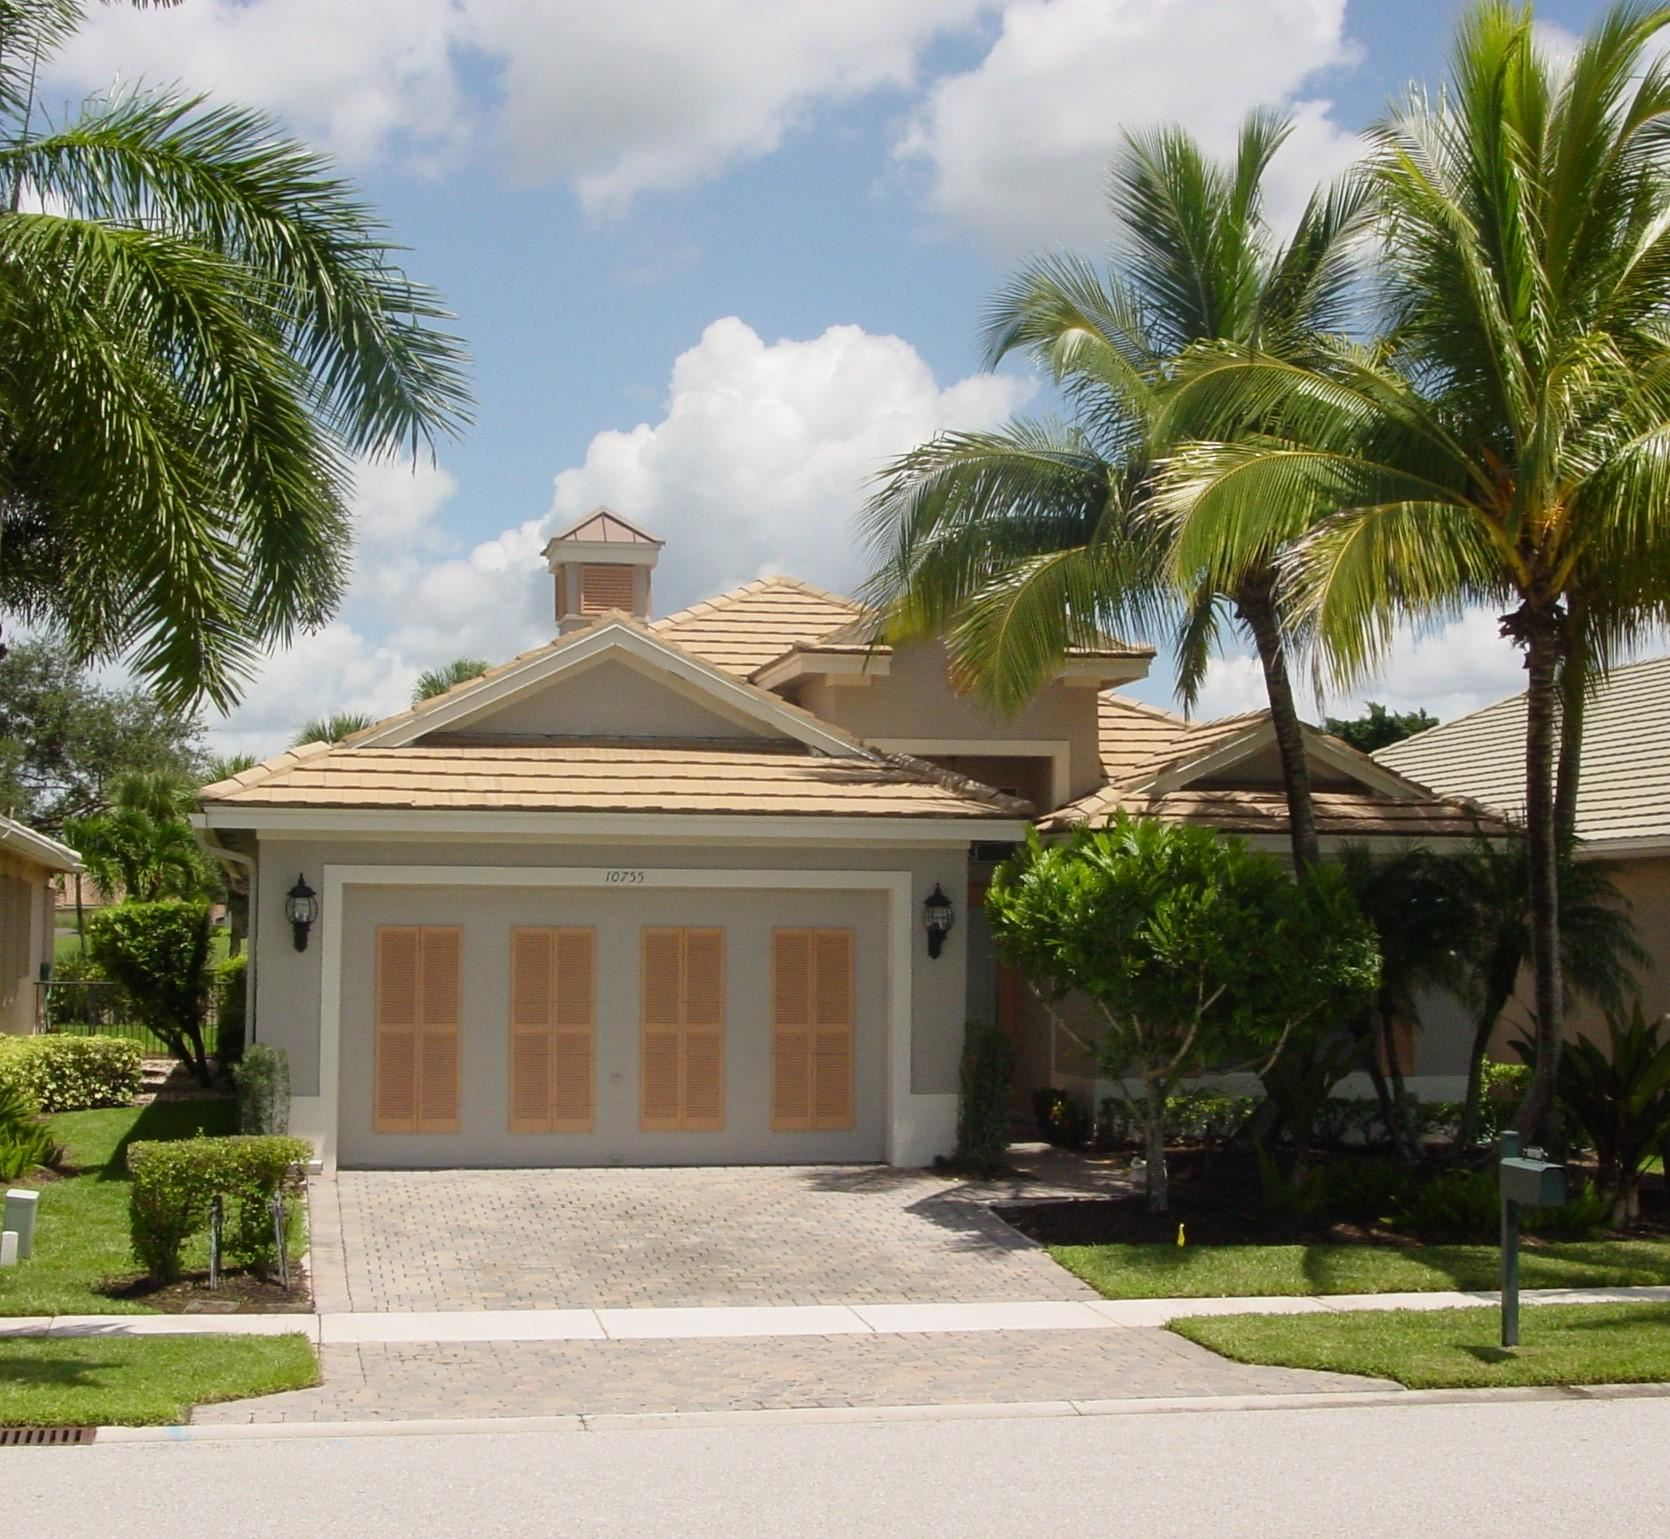 10795 La Strada, West Palm Beach, FL 33412 - MLS#: RX-10725536